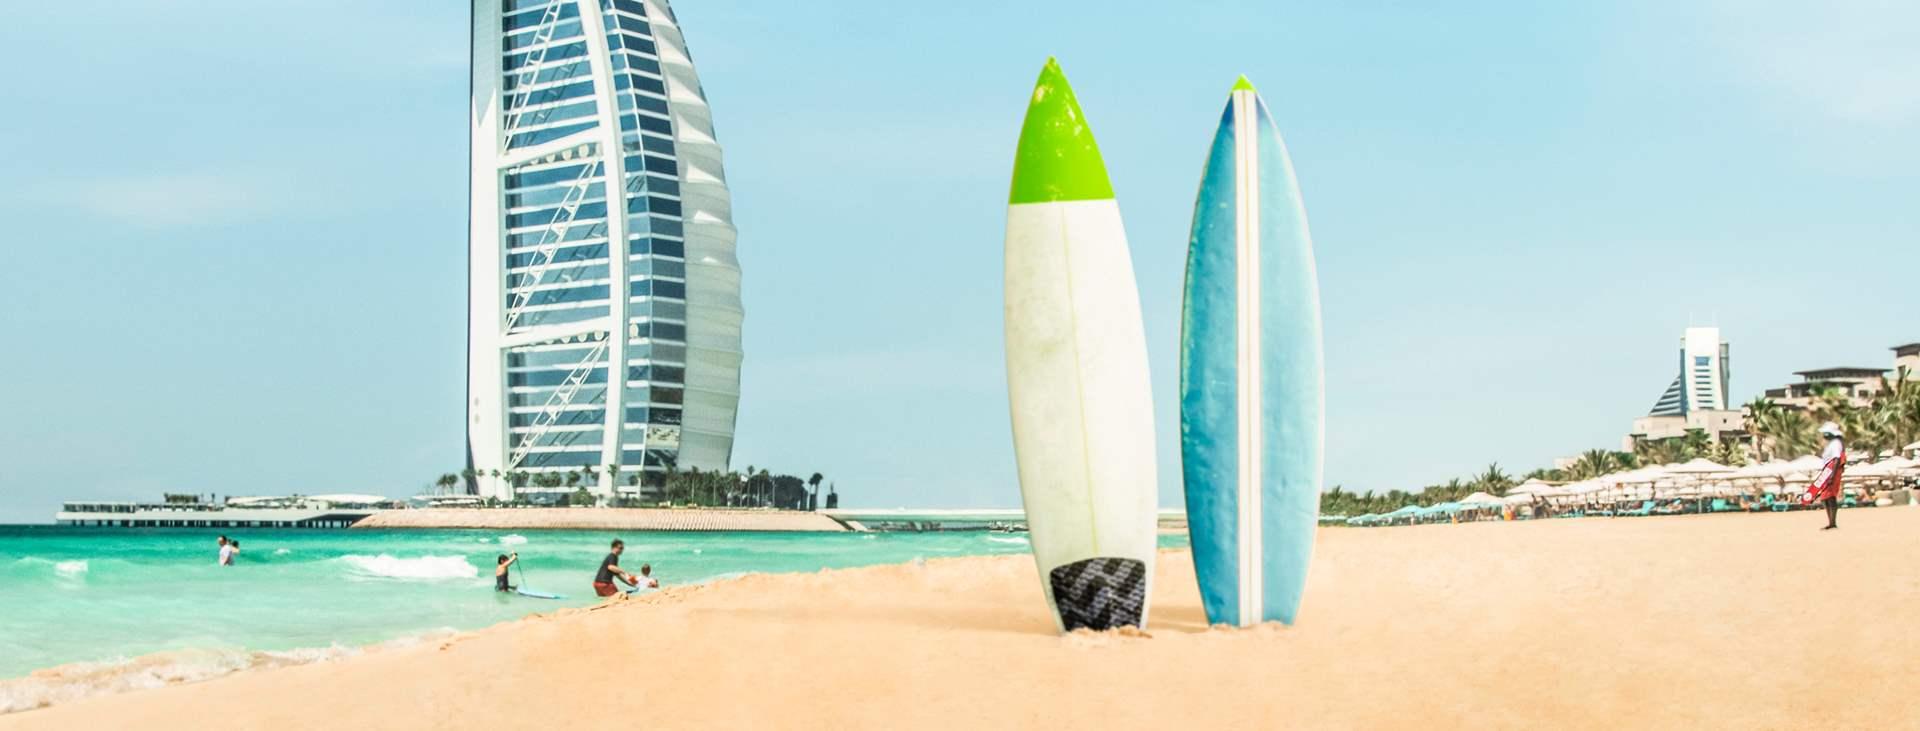 Boka en resa till strandparadiset i Dubai - Jumeirah Beach